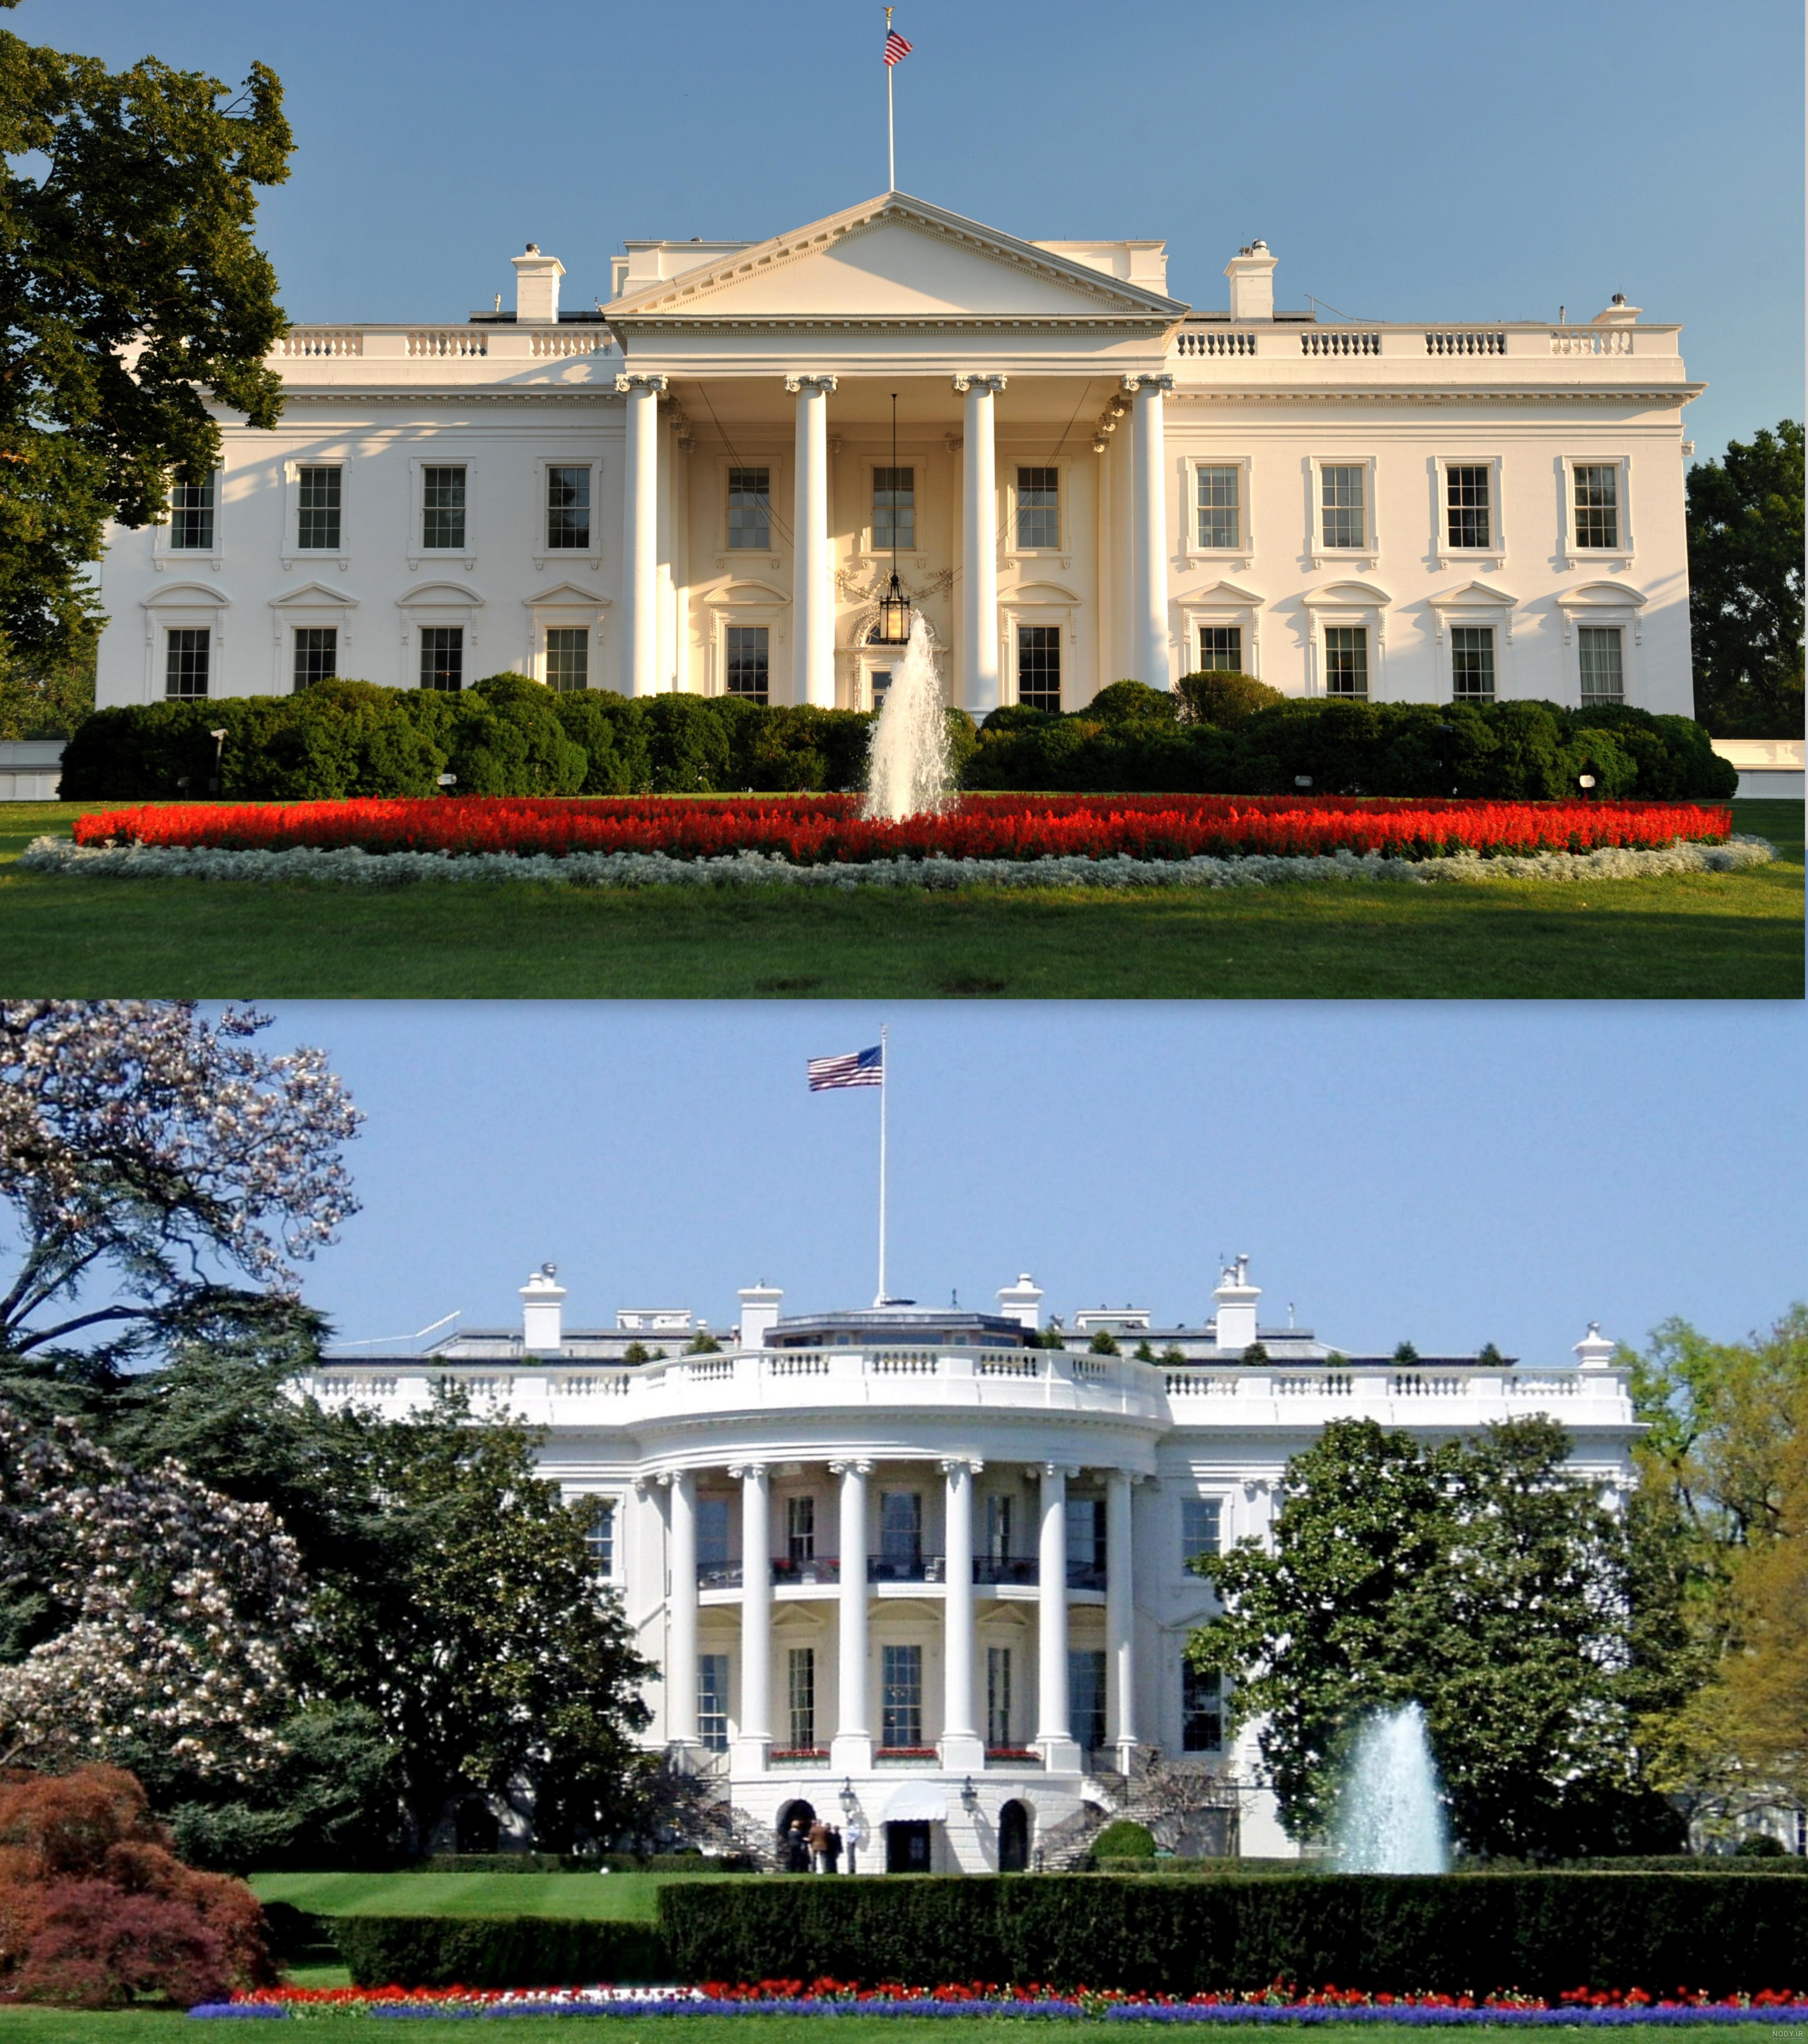 عکس کاخ سفید آمریکا